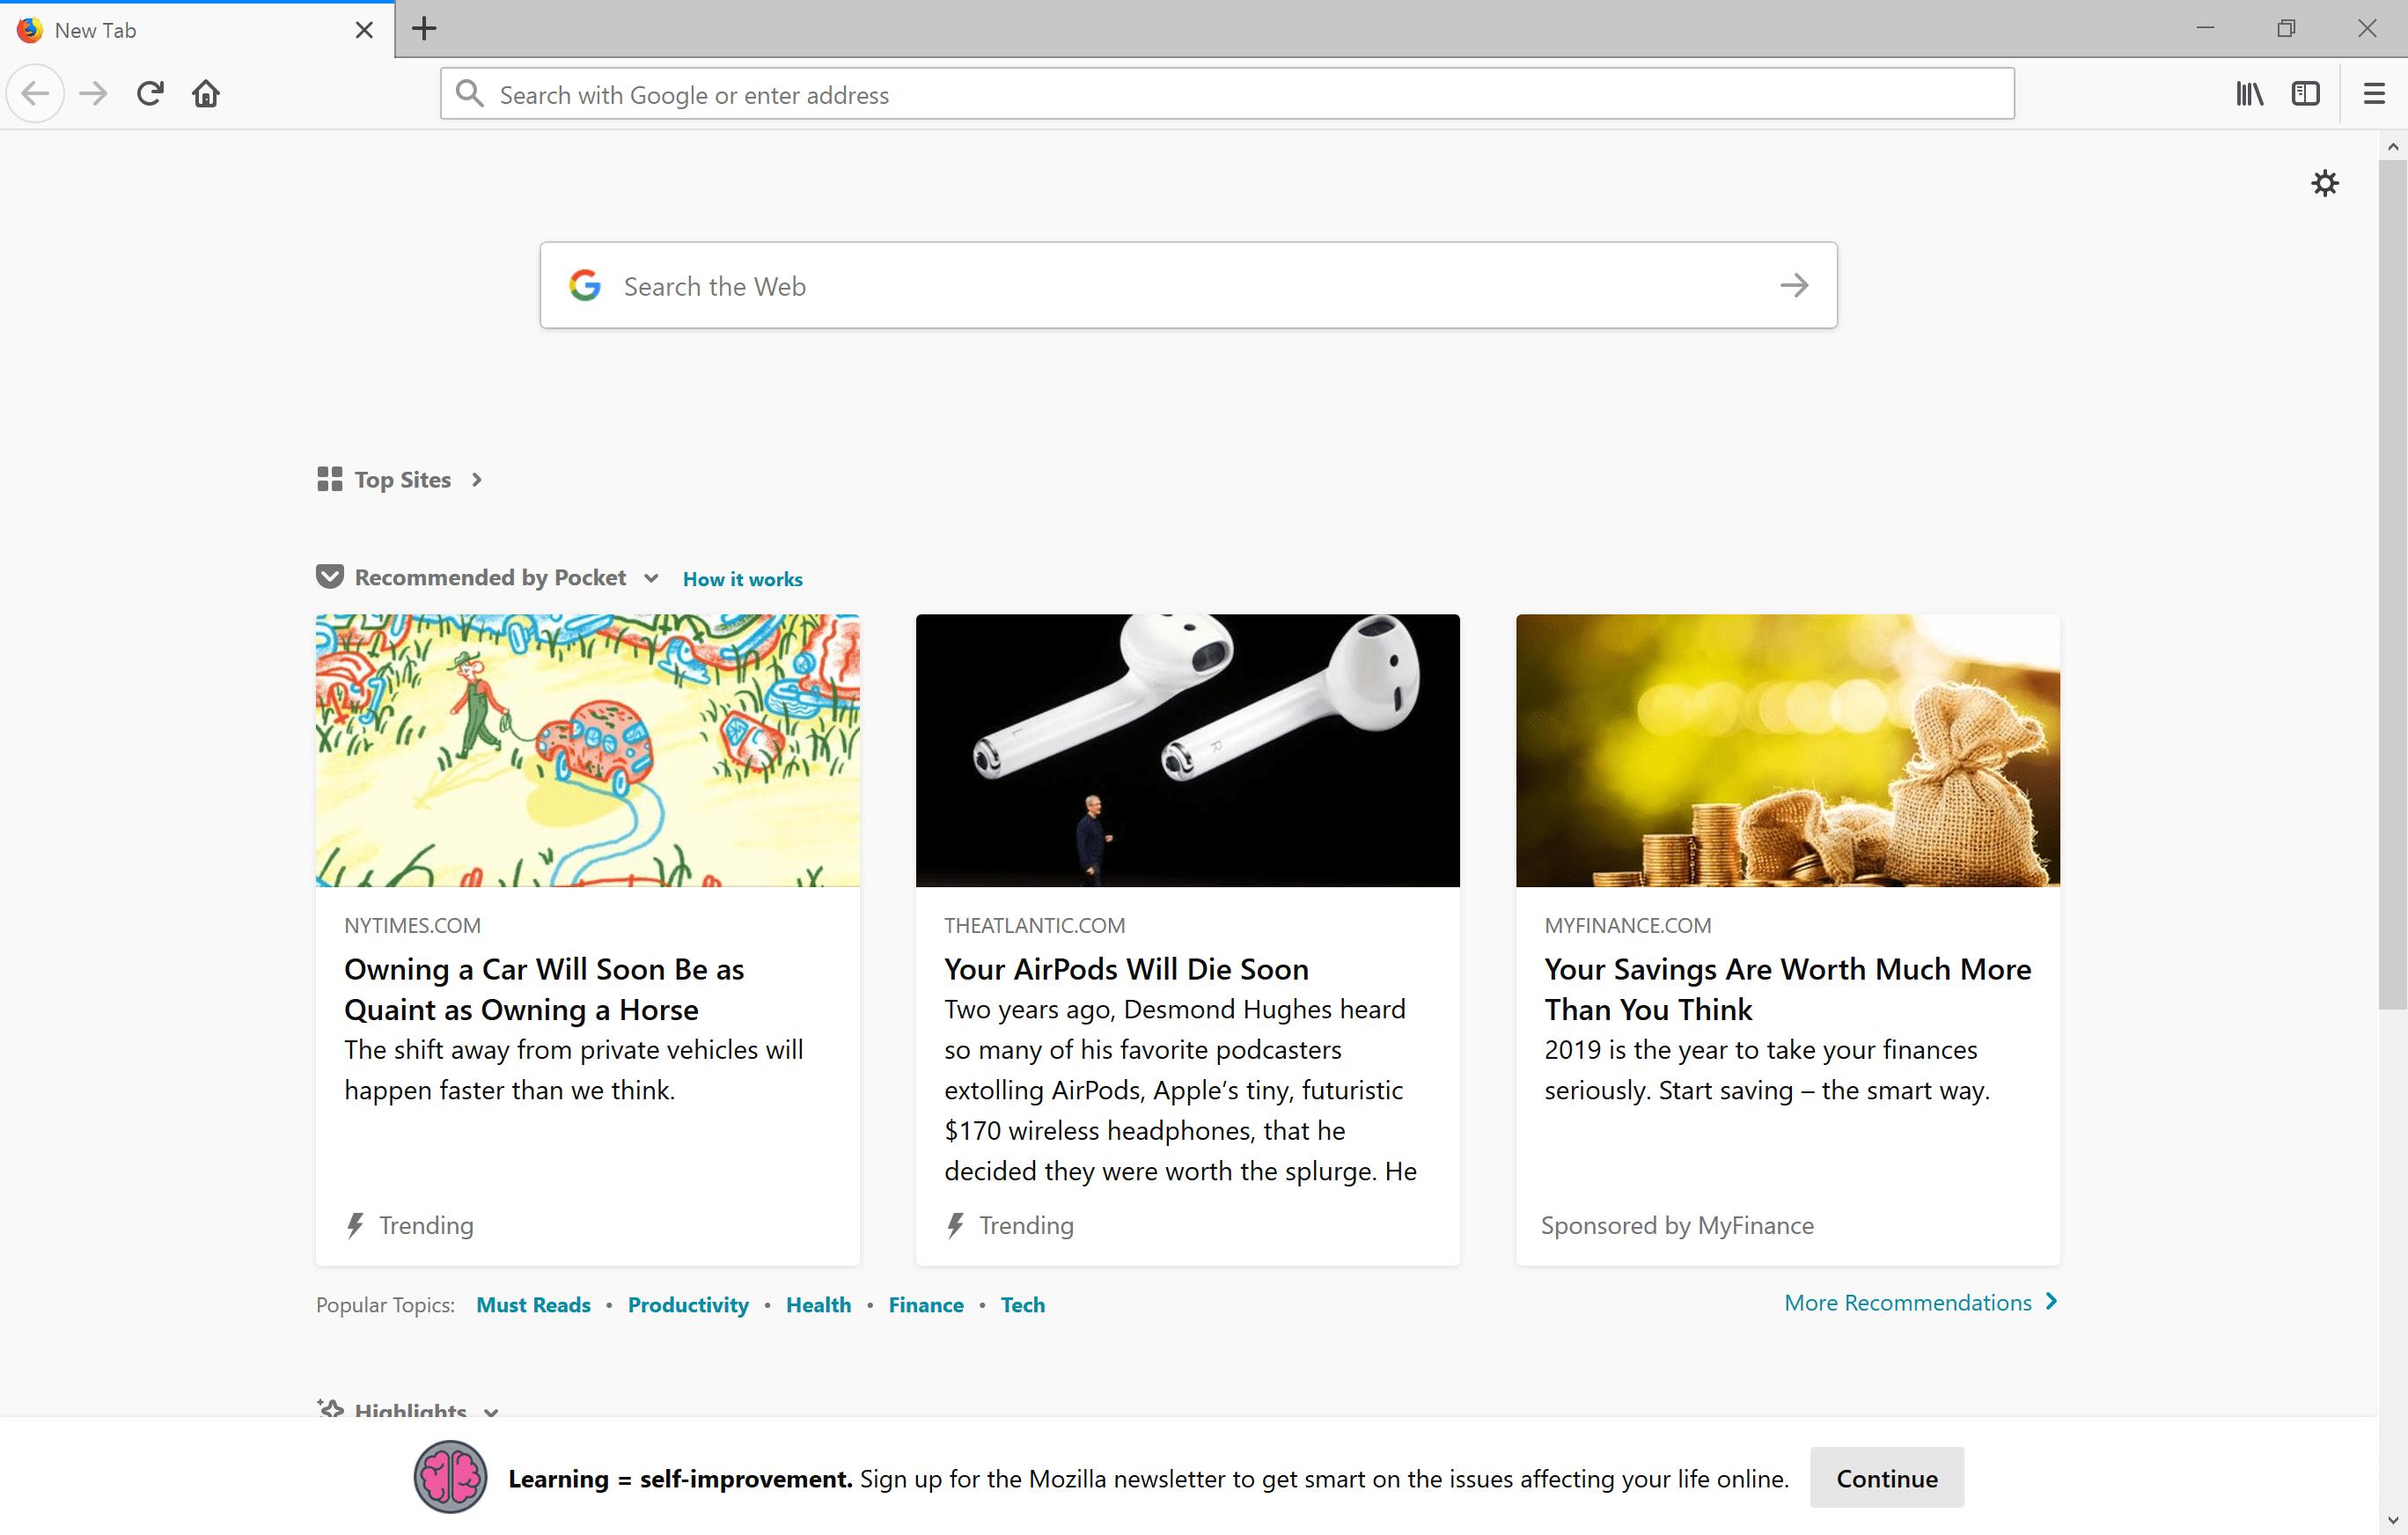 Firefox main window.